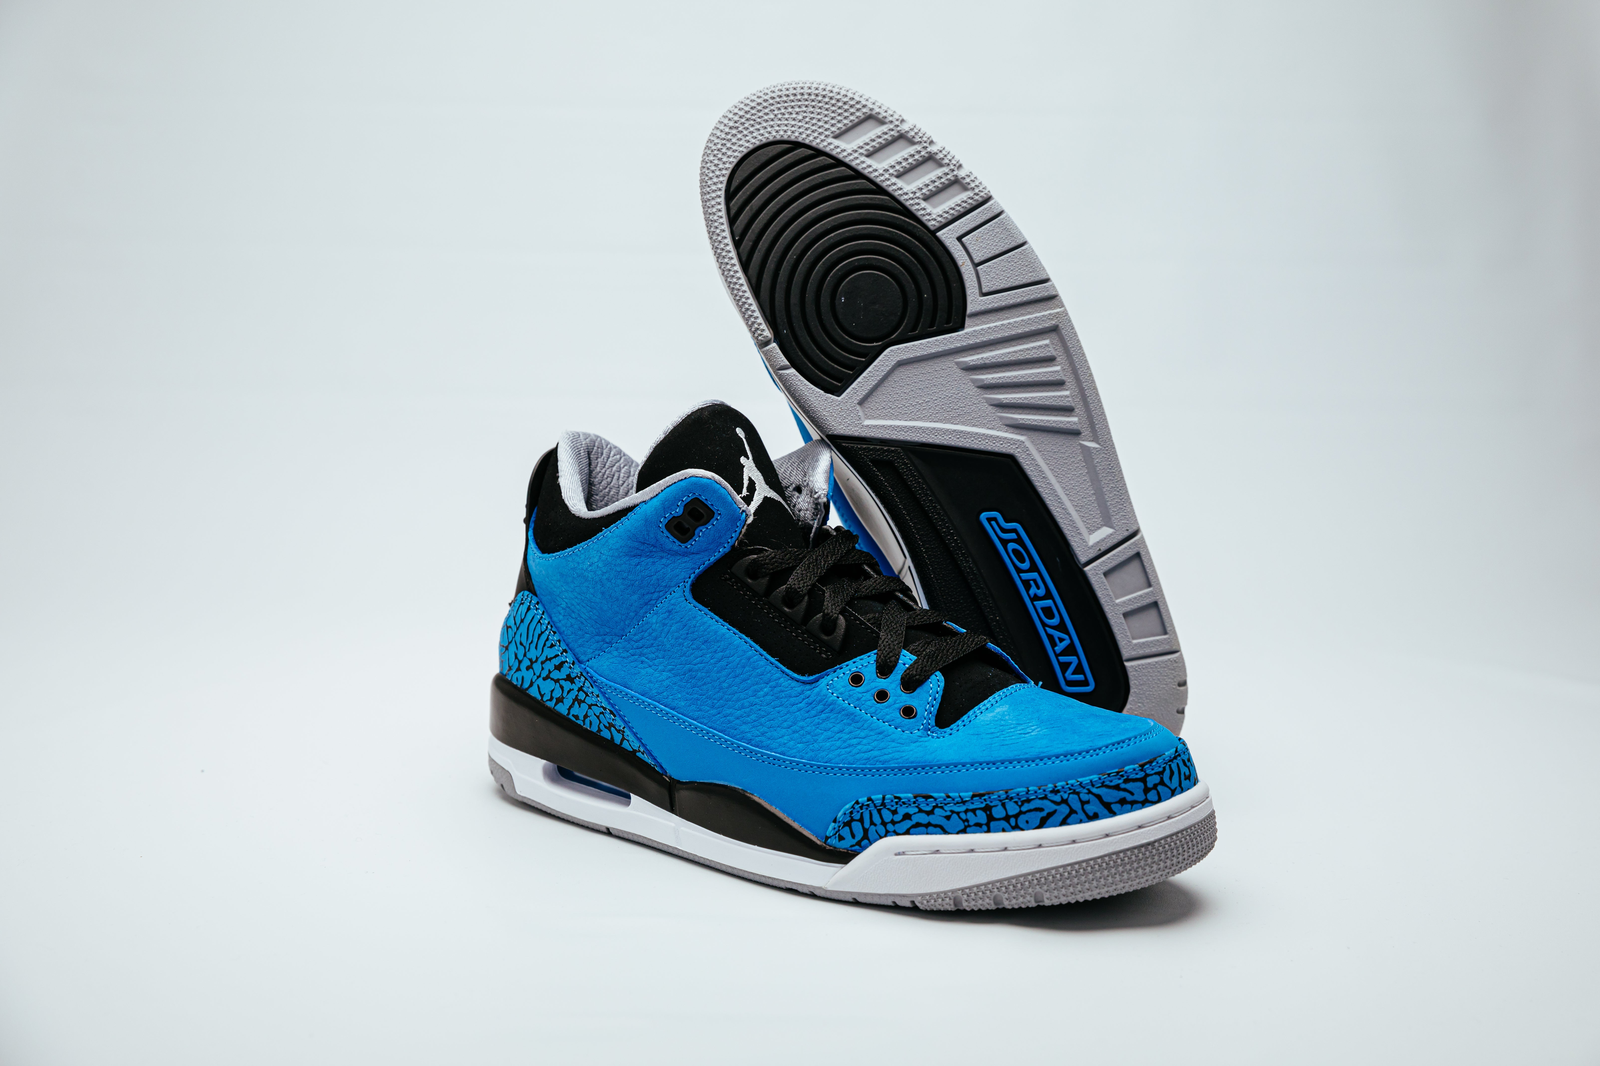 Air Jordan 3 Retro - Powder Blue